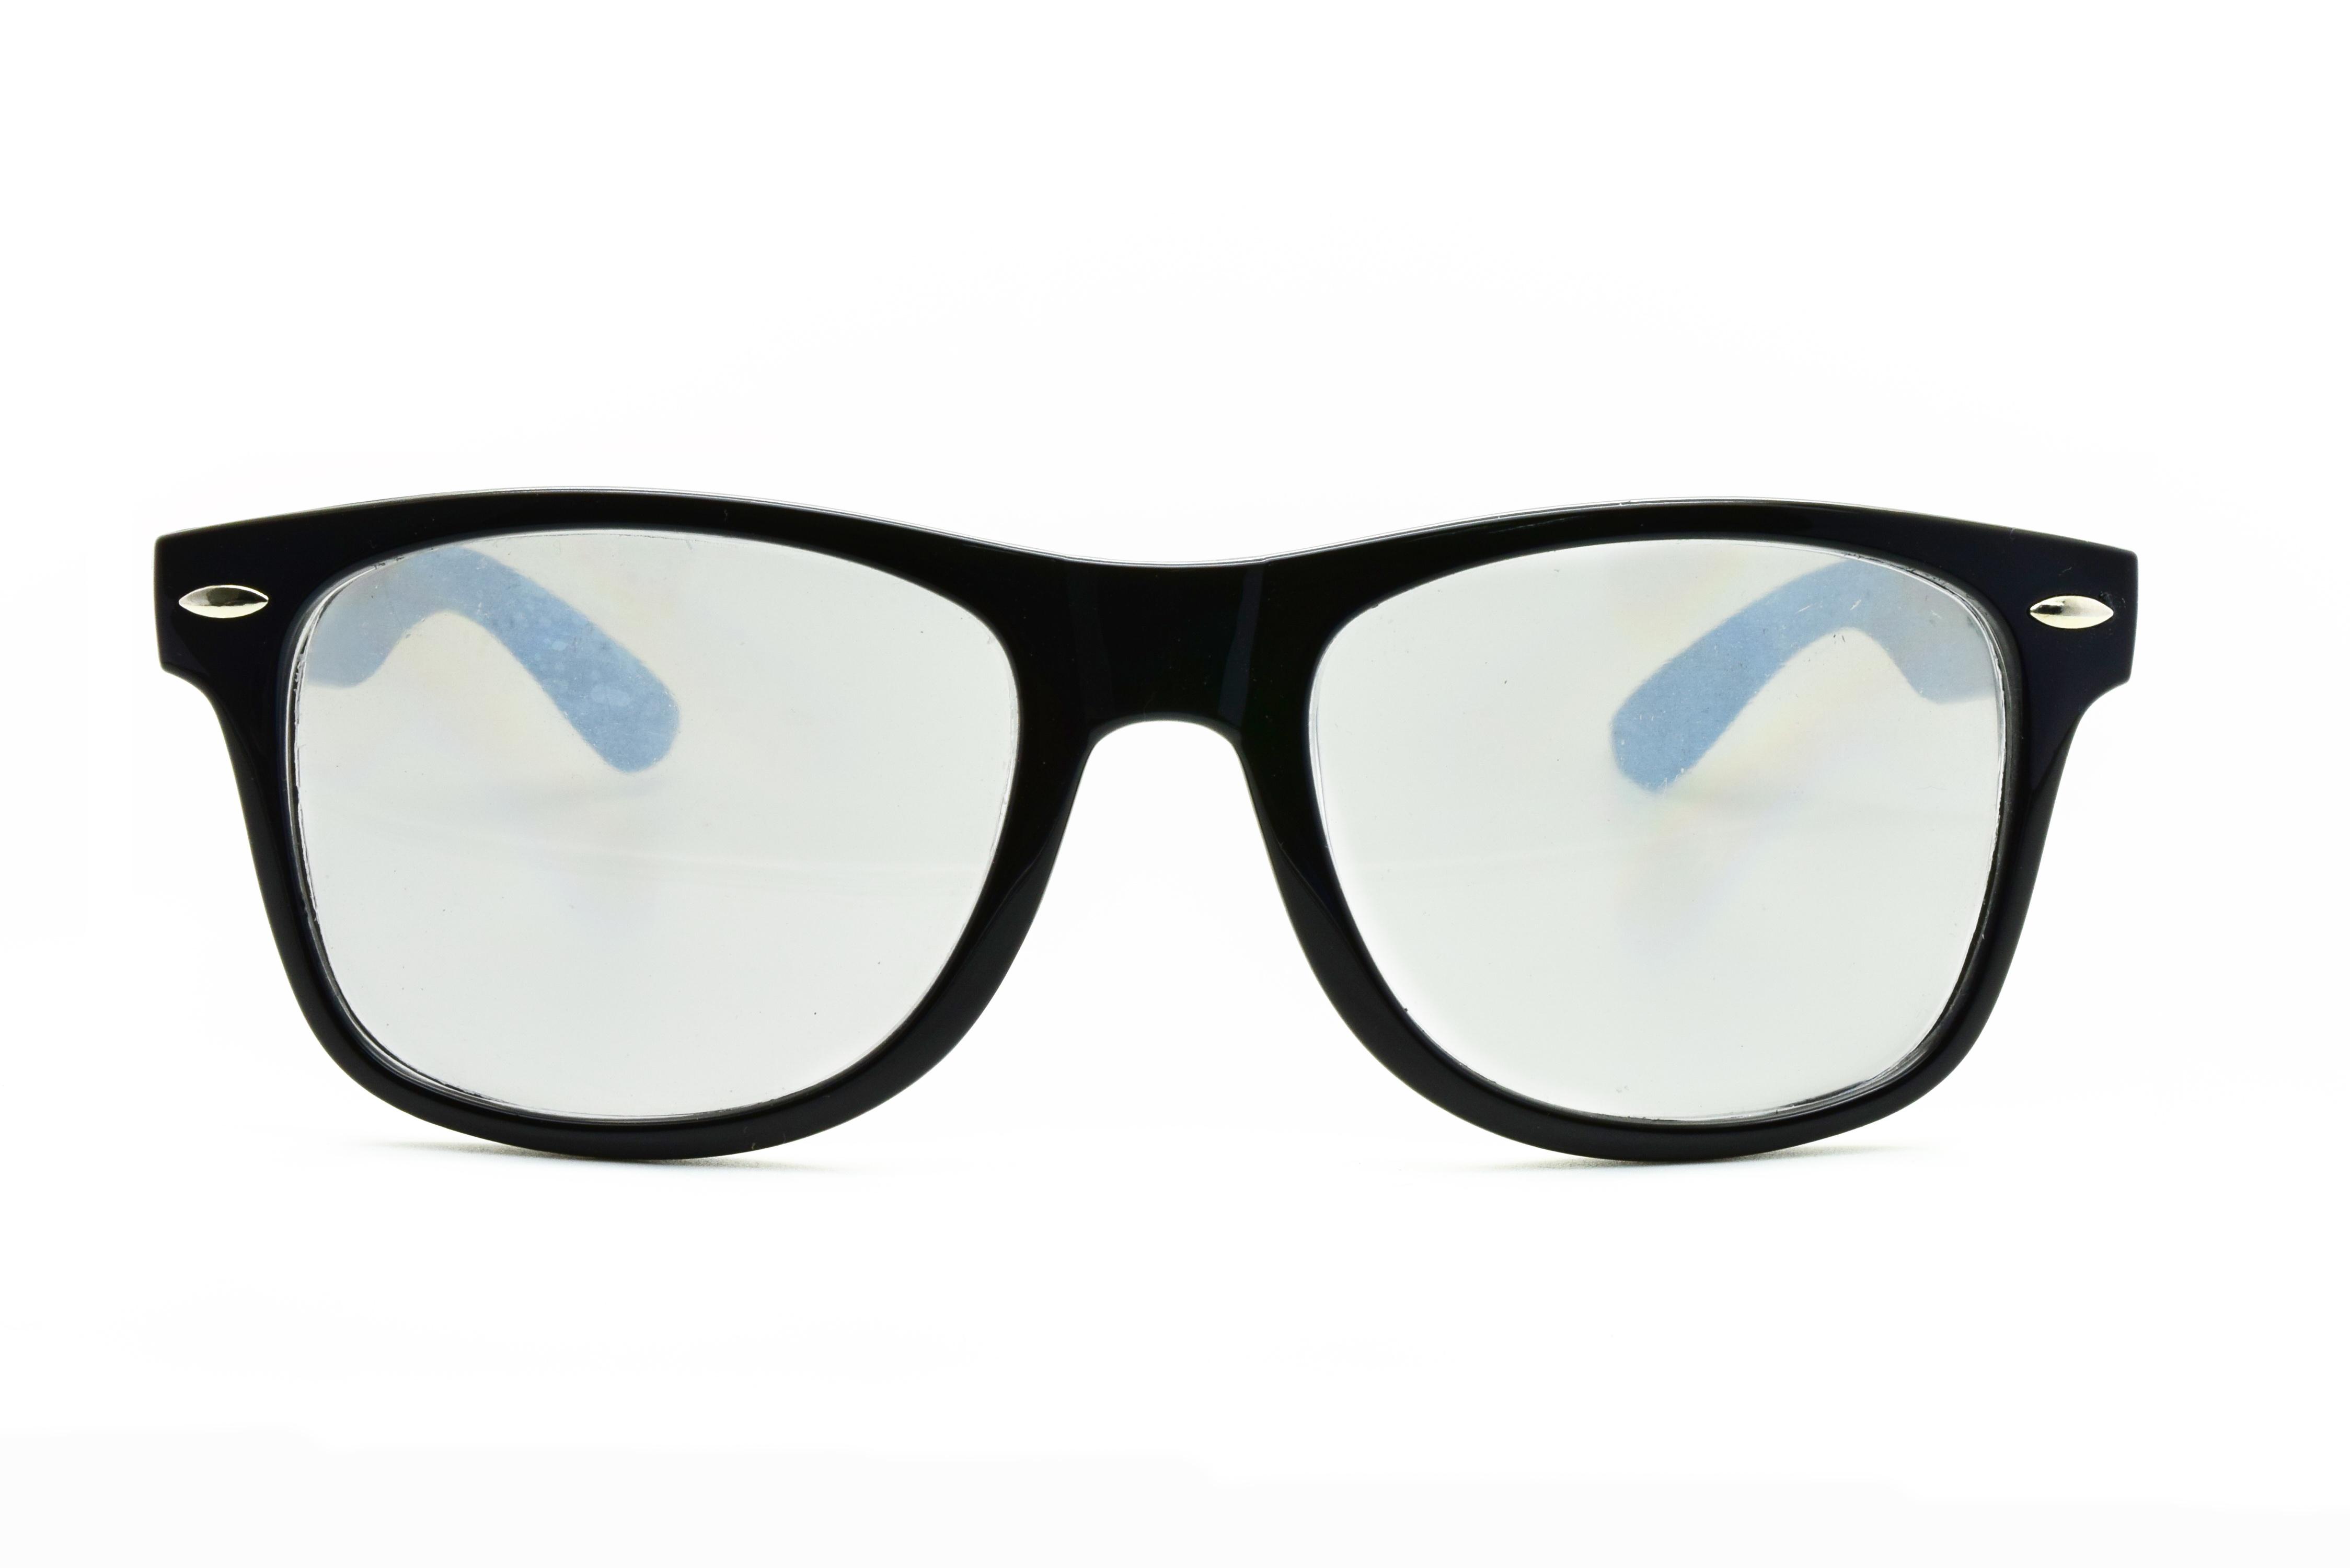 ASVP-Shop-Ultimate-Diffraction-Glasses Indexbild 3